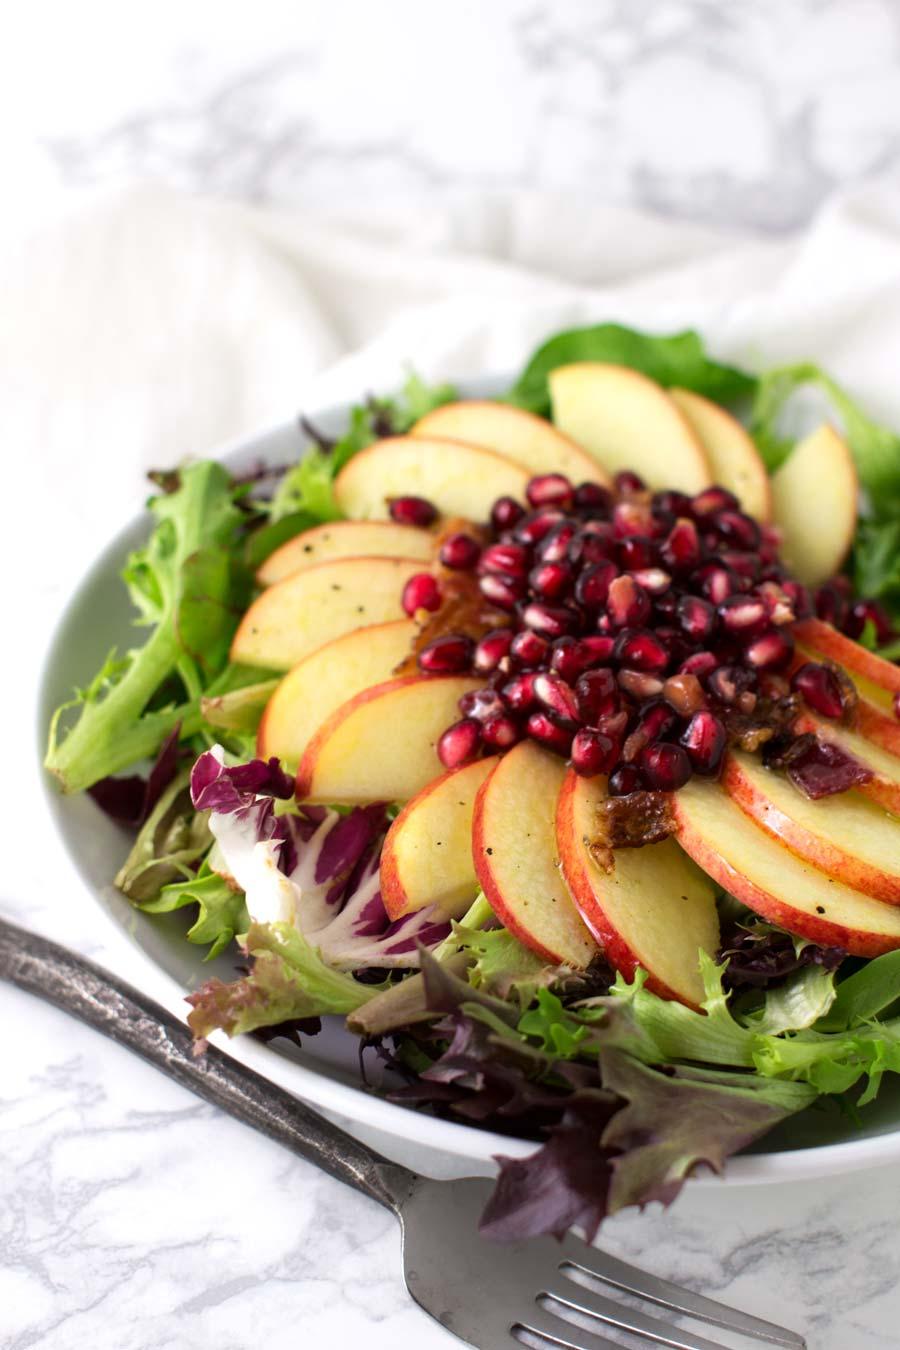 Arugula Pomegranate Salad recipe from acleanplate.com #paleo #aip #autoimmuneprotocol